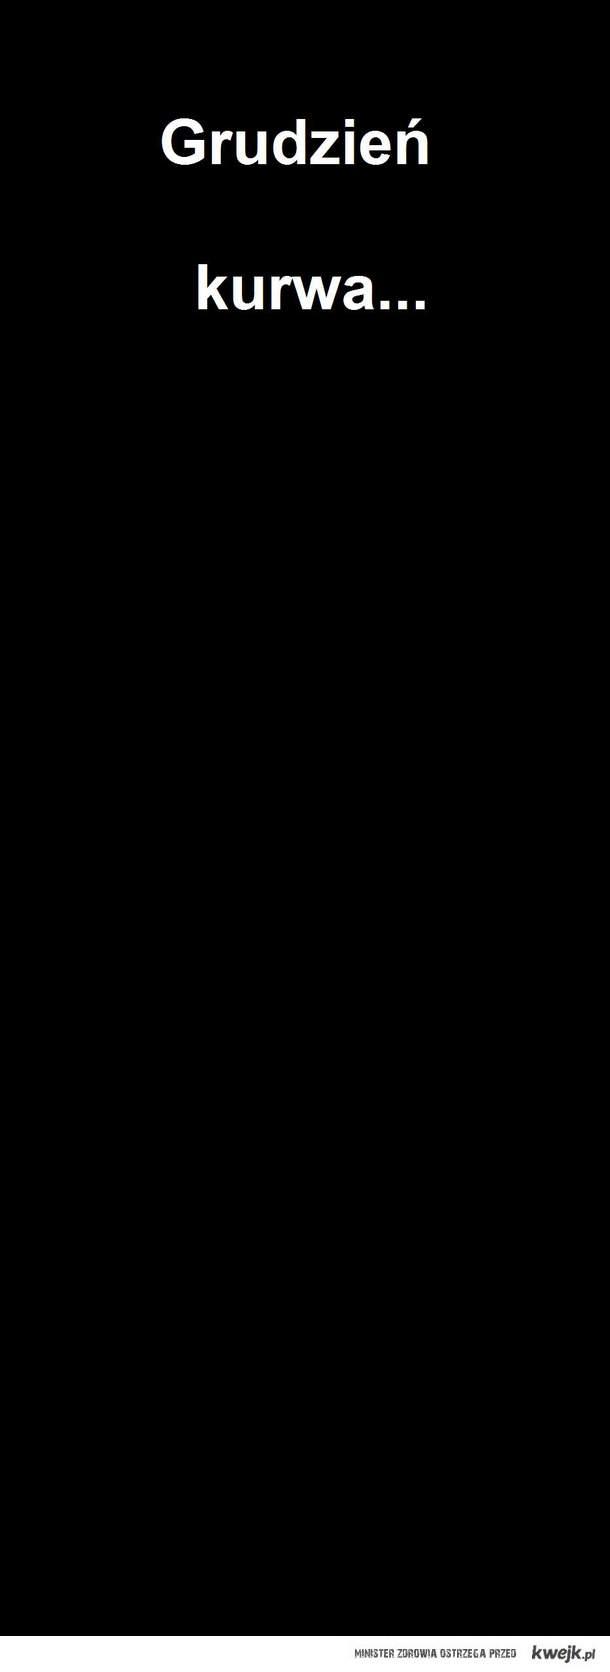 Grudzień